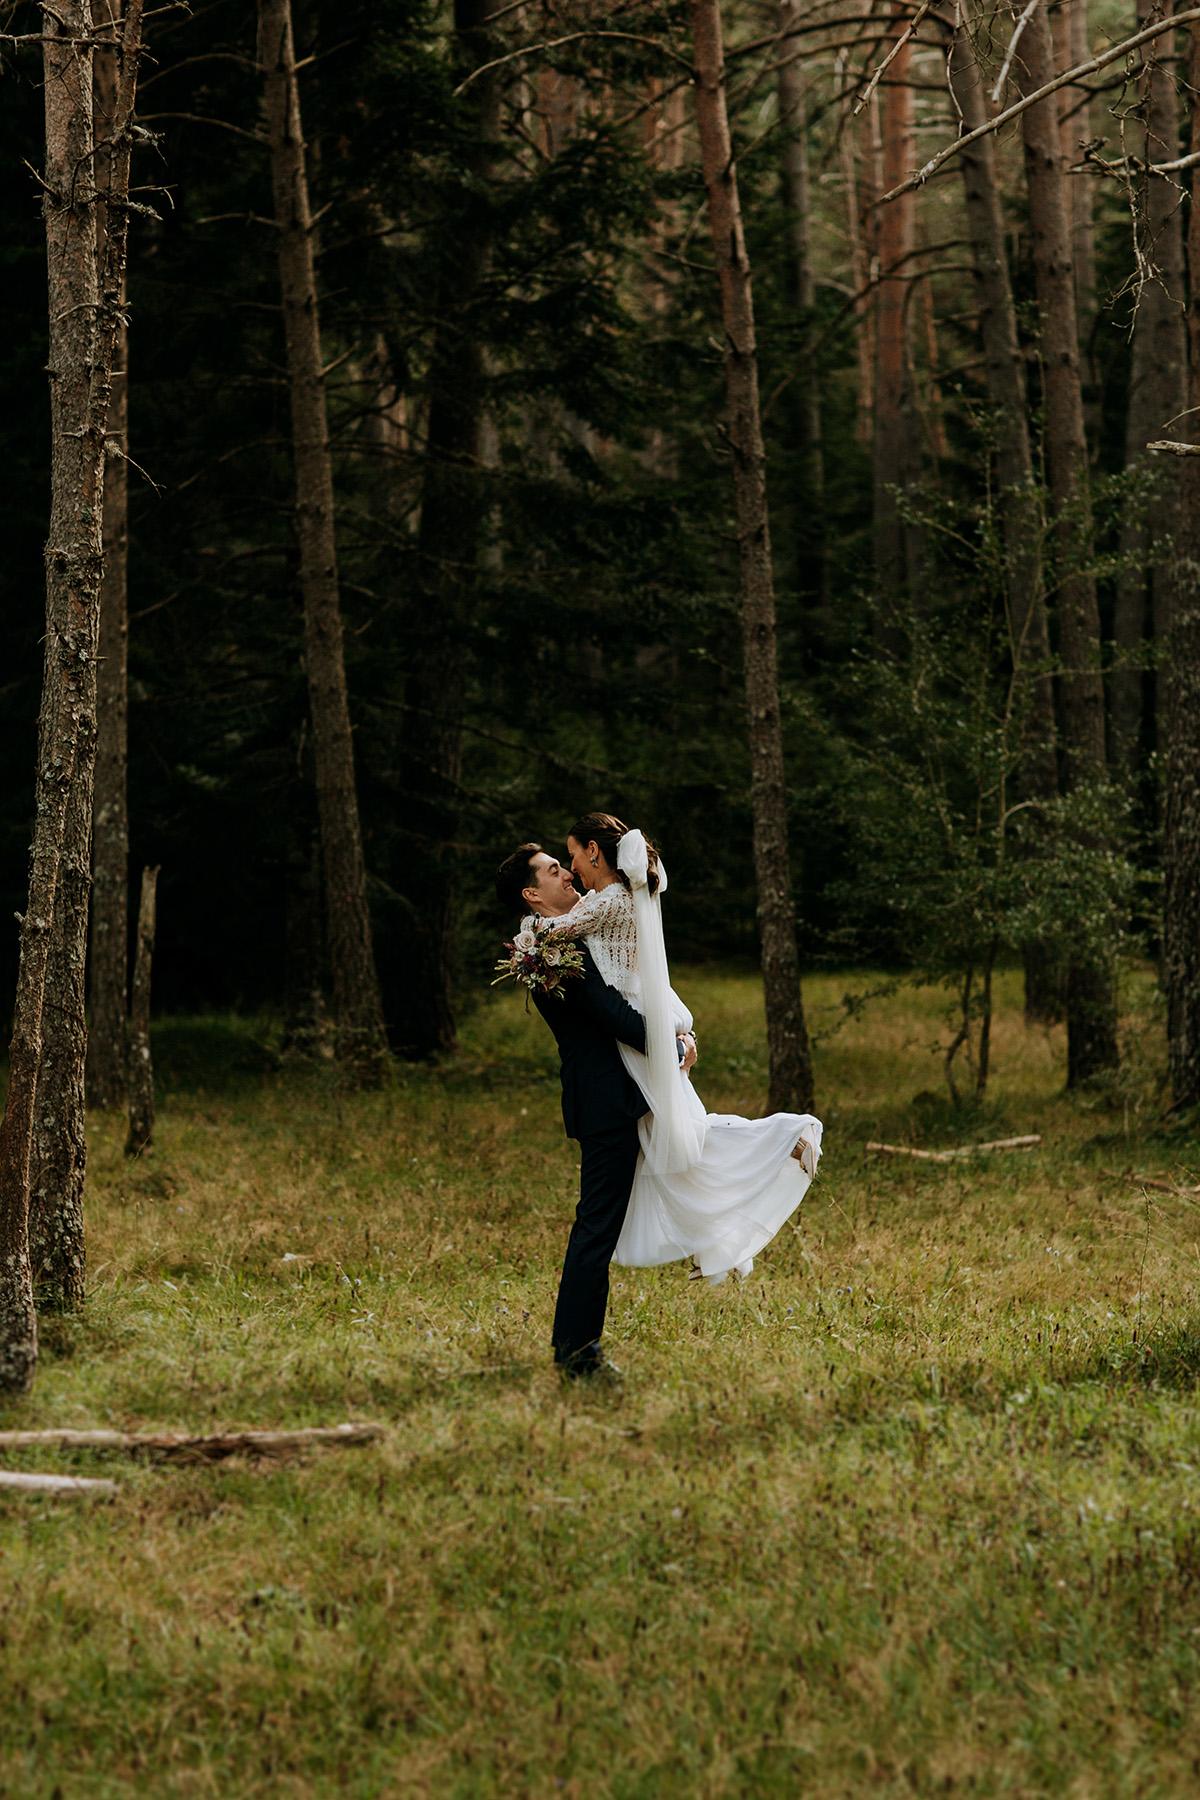 Boda-civil-zaragoza-huesca-pineta-pirineos-aragon-jose-reyes-destination-wedding_048.jpg